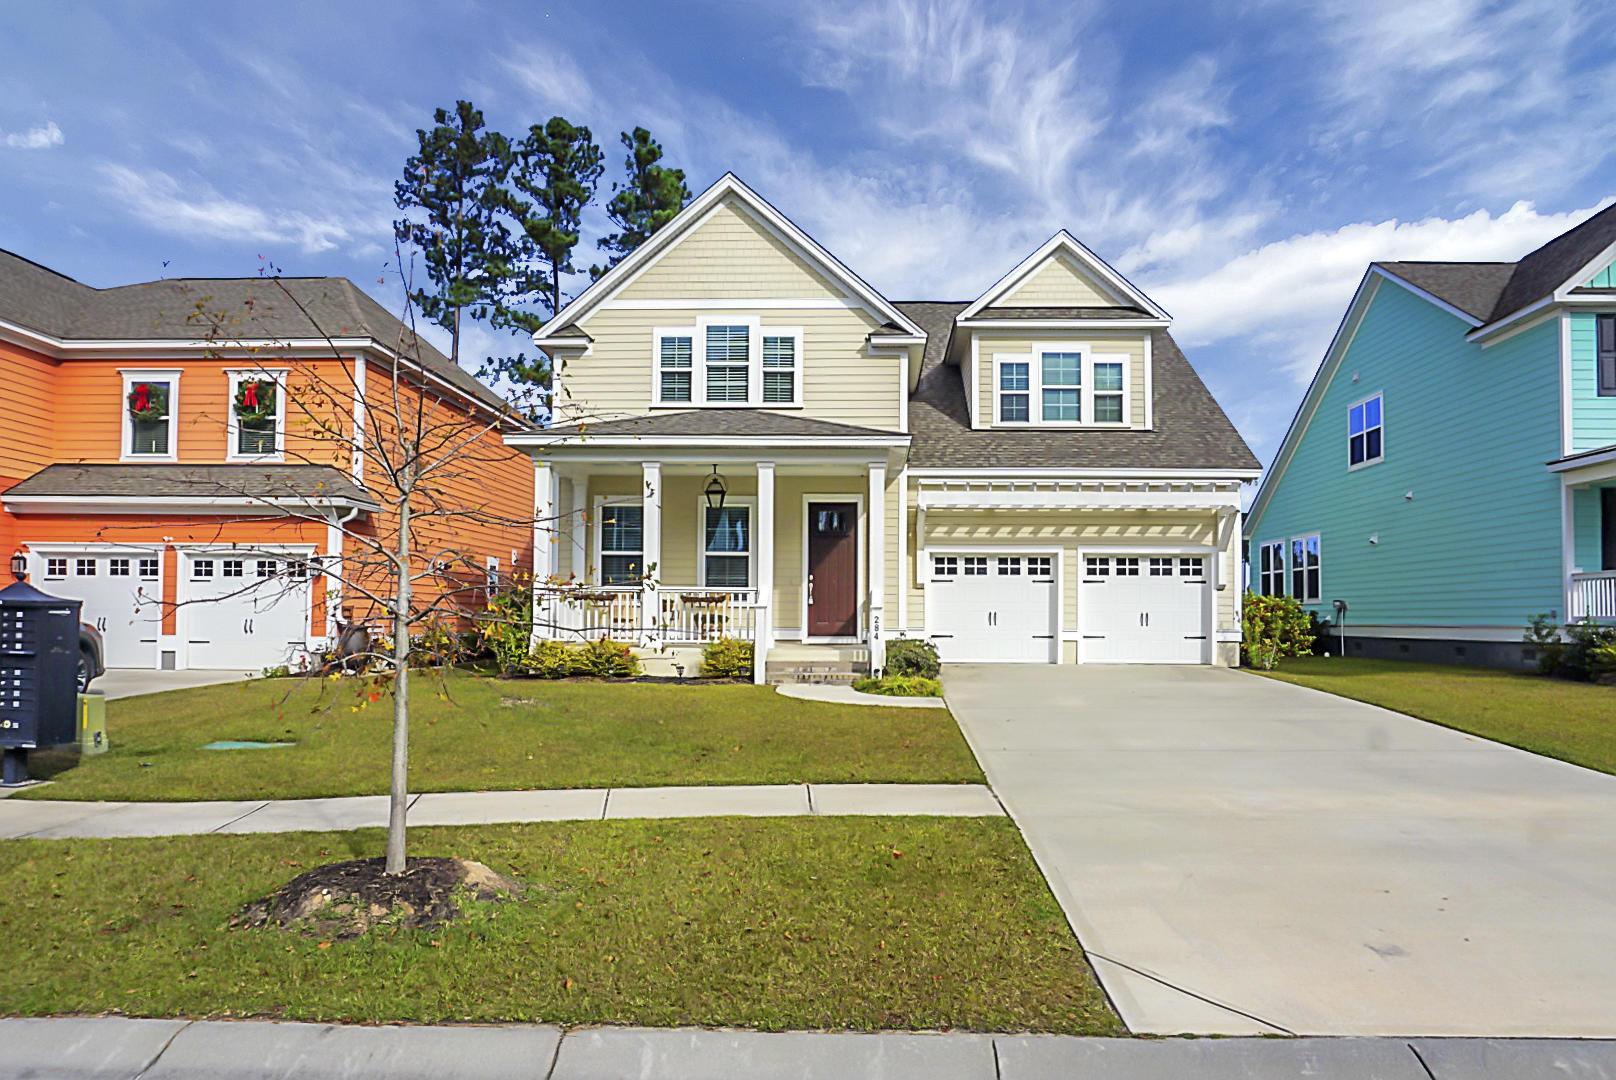 Cane Bay Plantation Homes For Sale - 284 Calm Water, Summerville, SC - 24